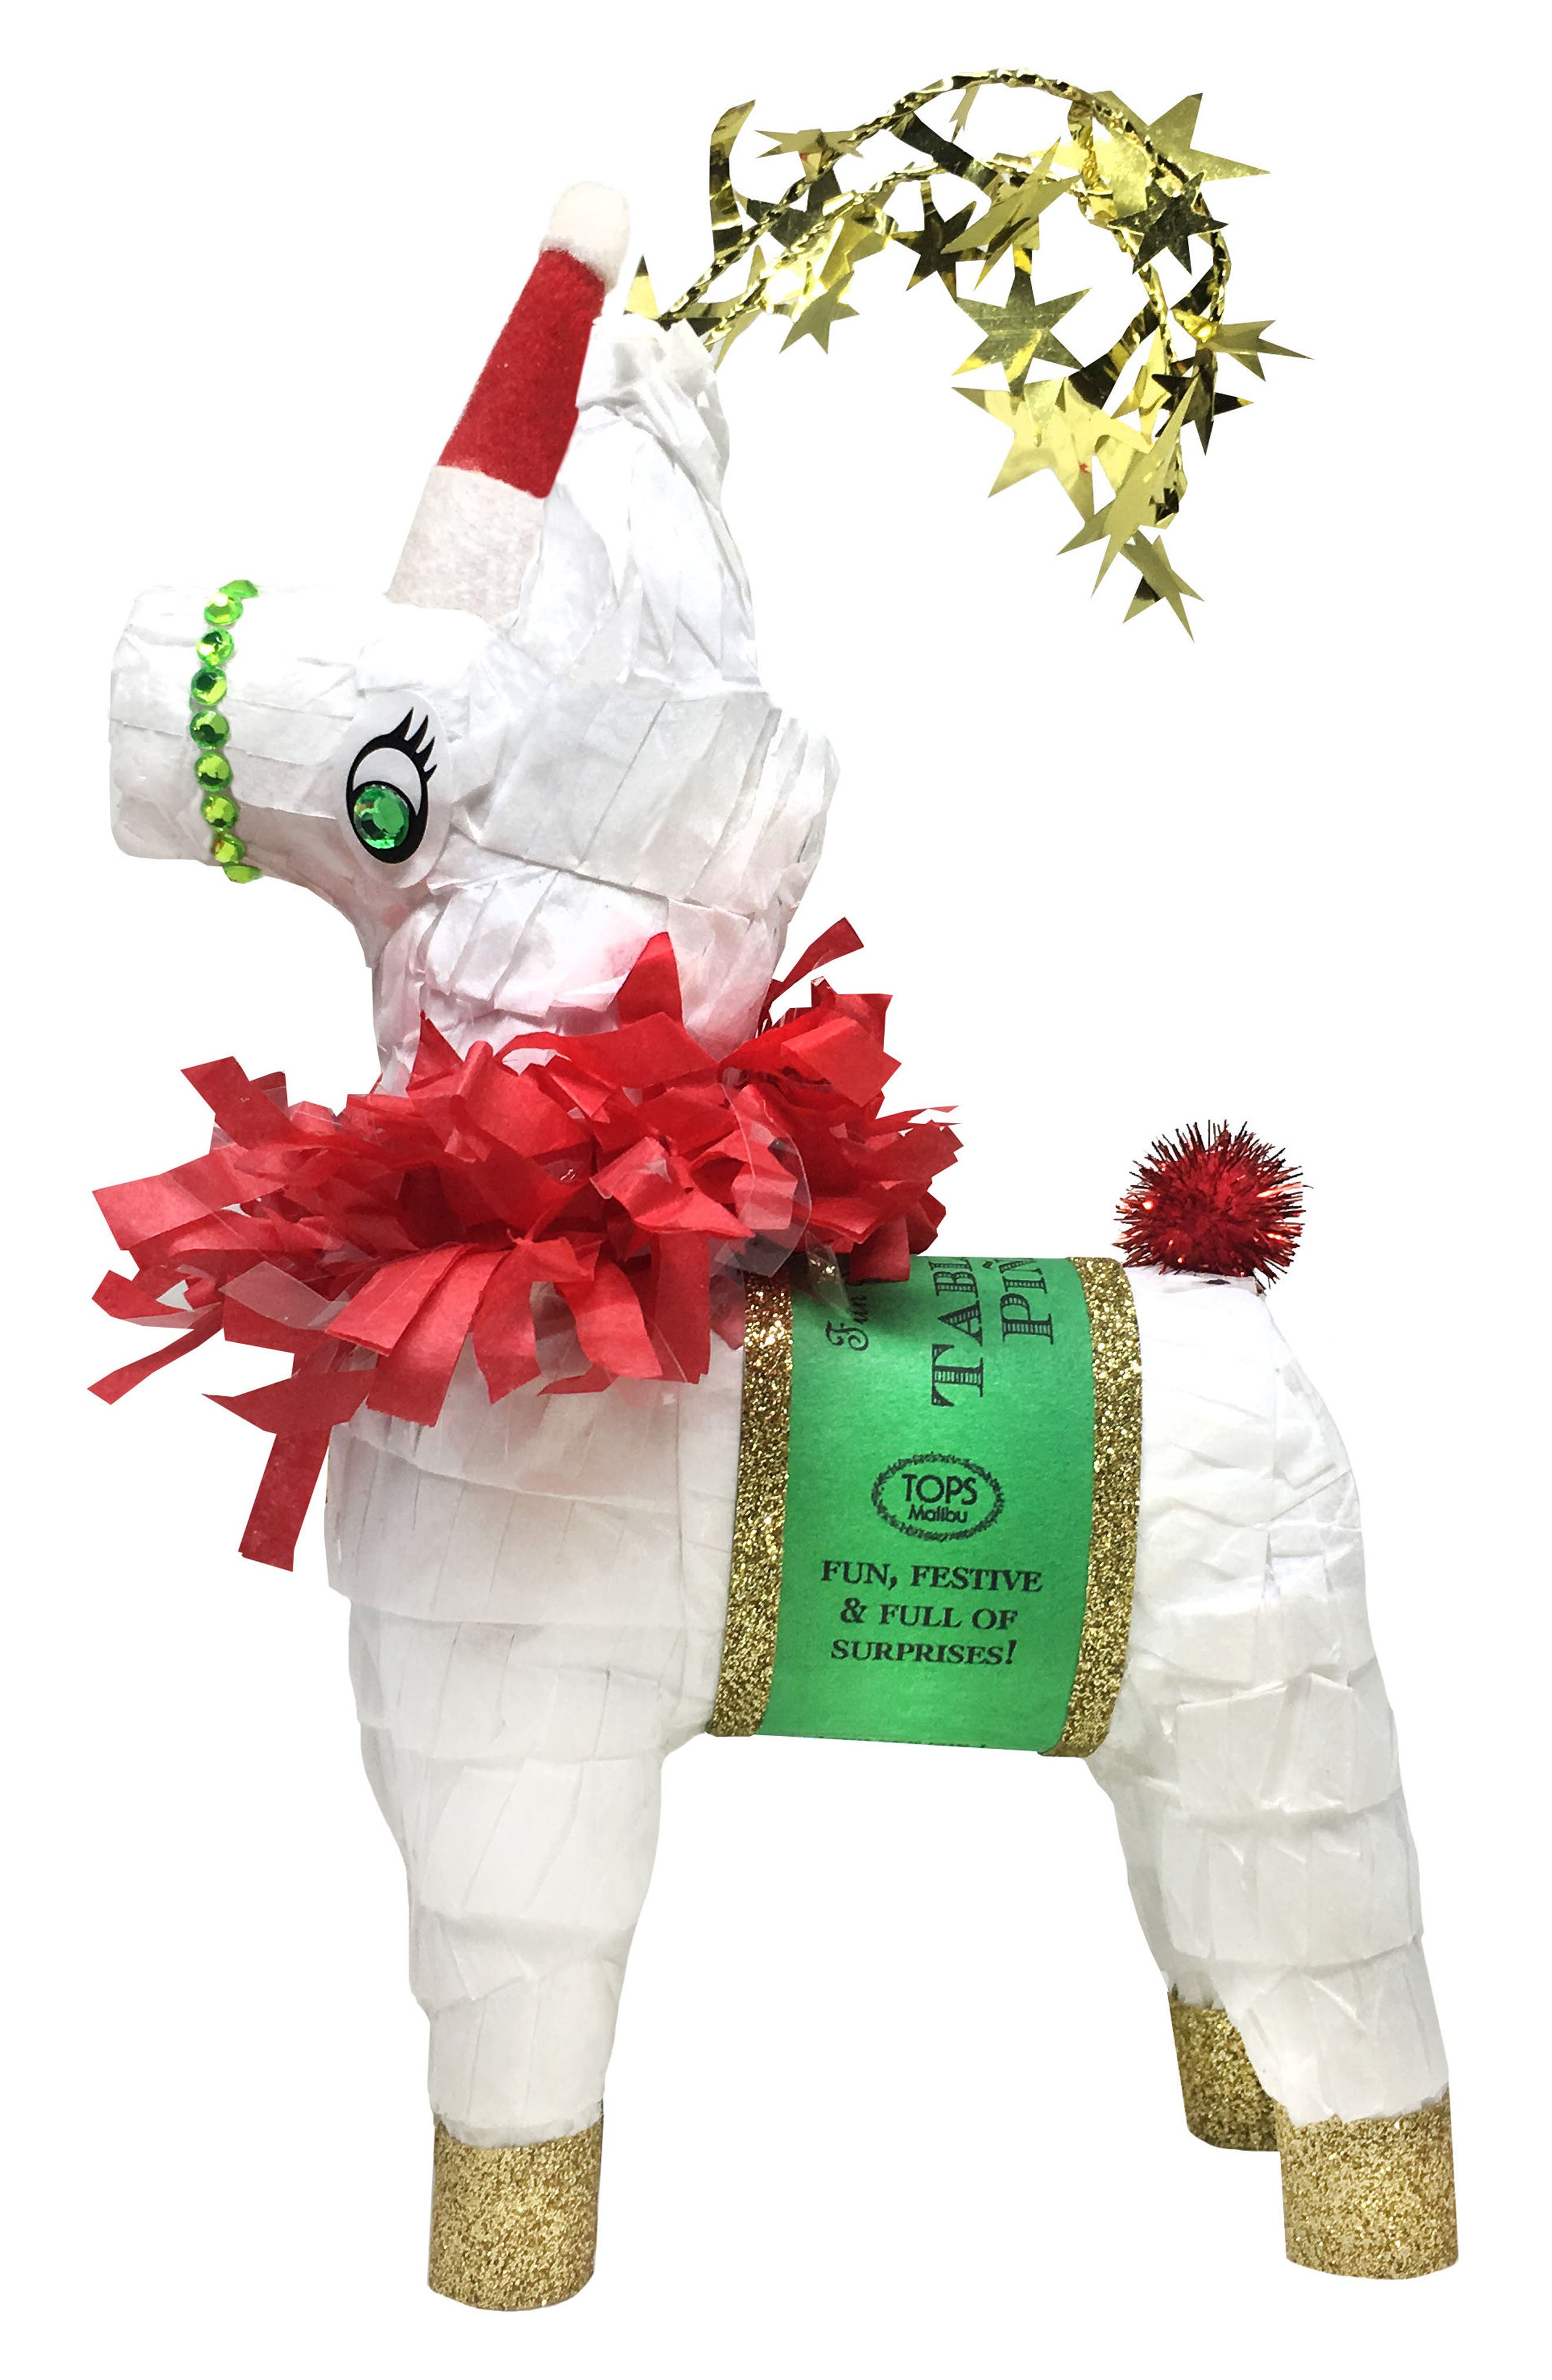 Tops Malibu Mini Tabletop Reindeer Piñata